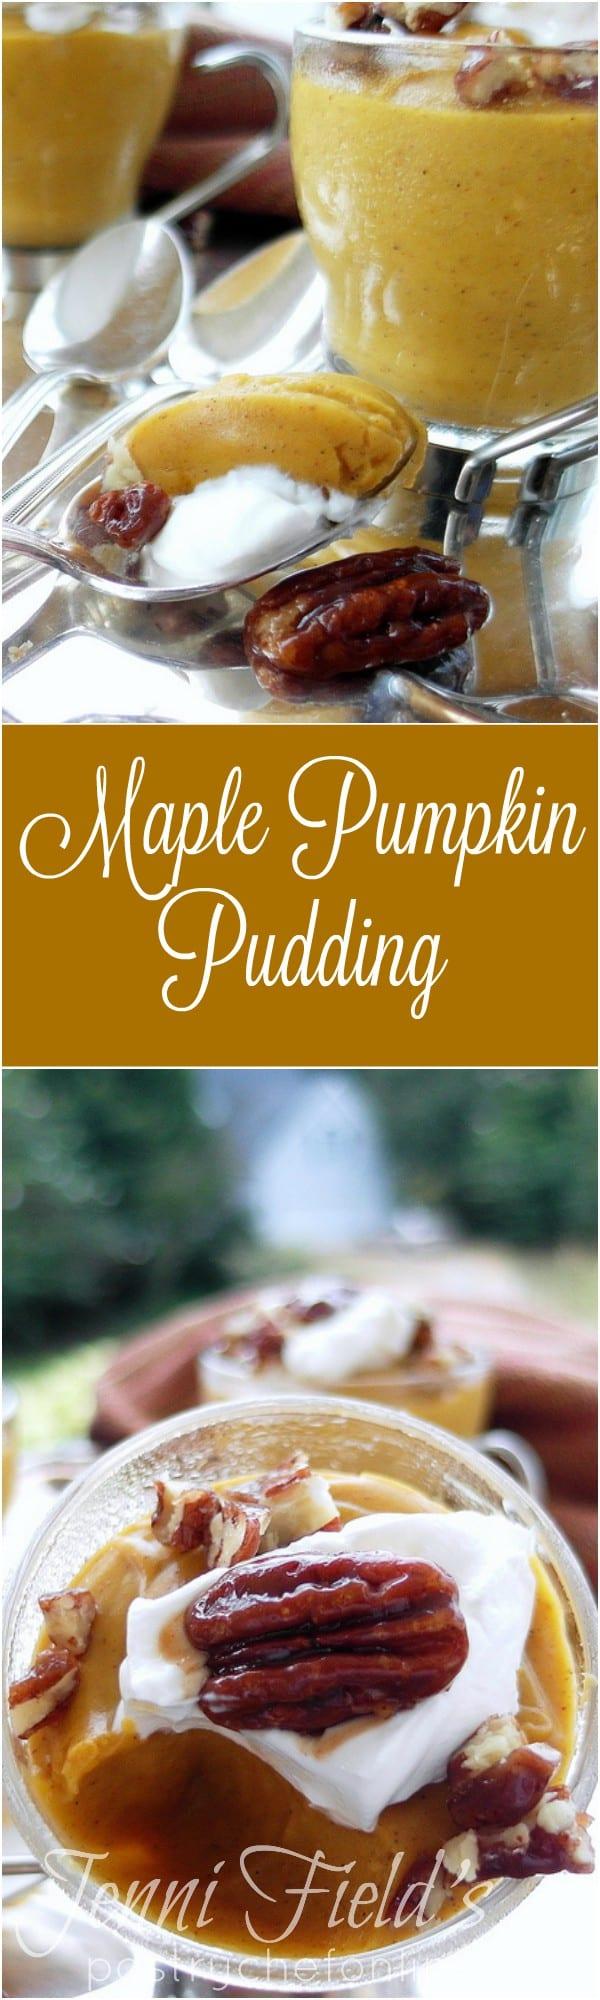 Maple Pumpkin Pudding collage.